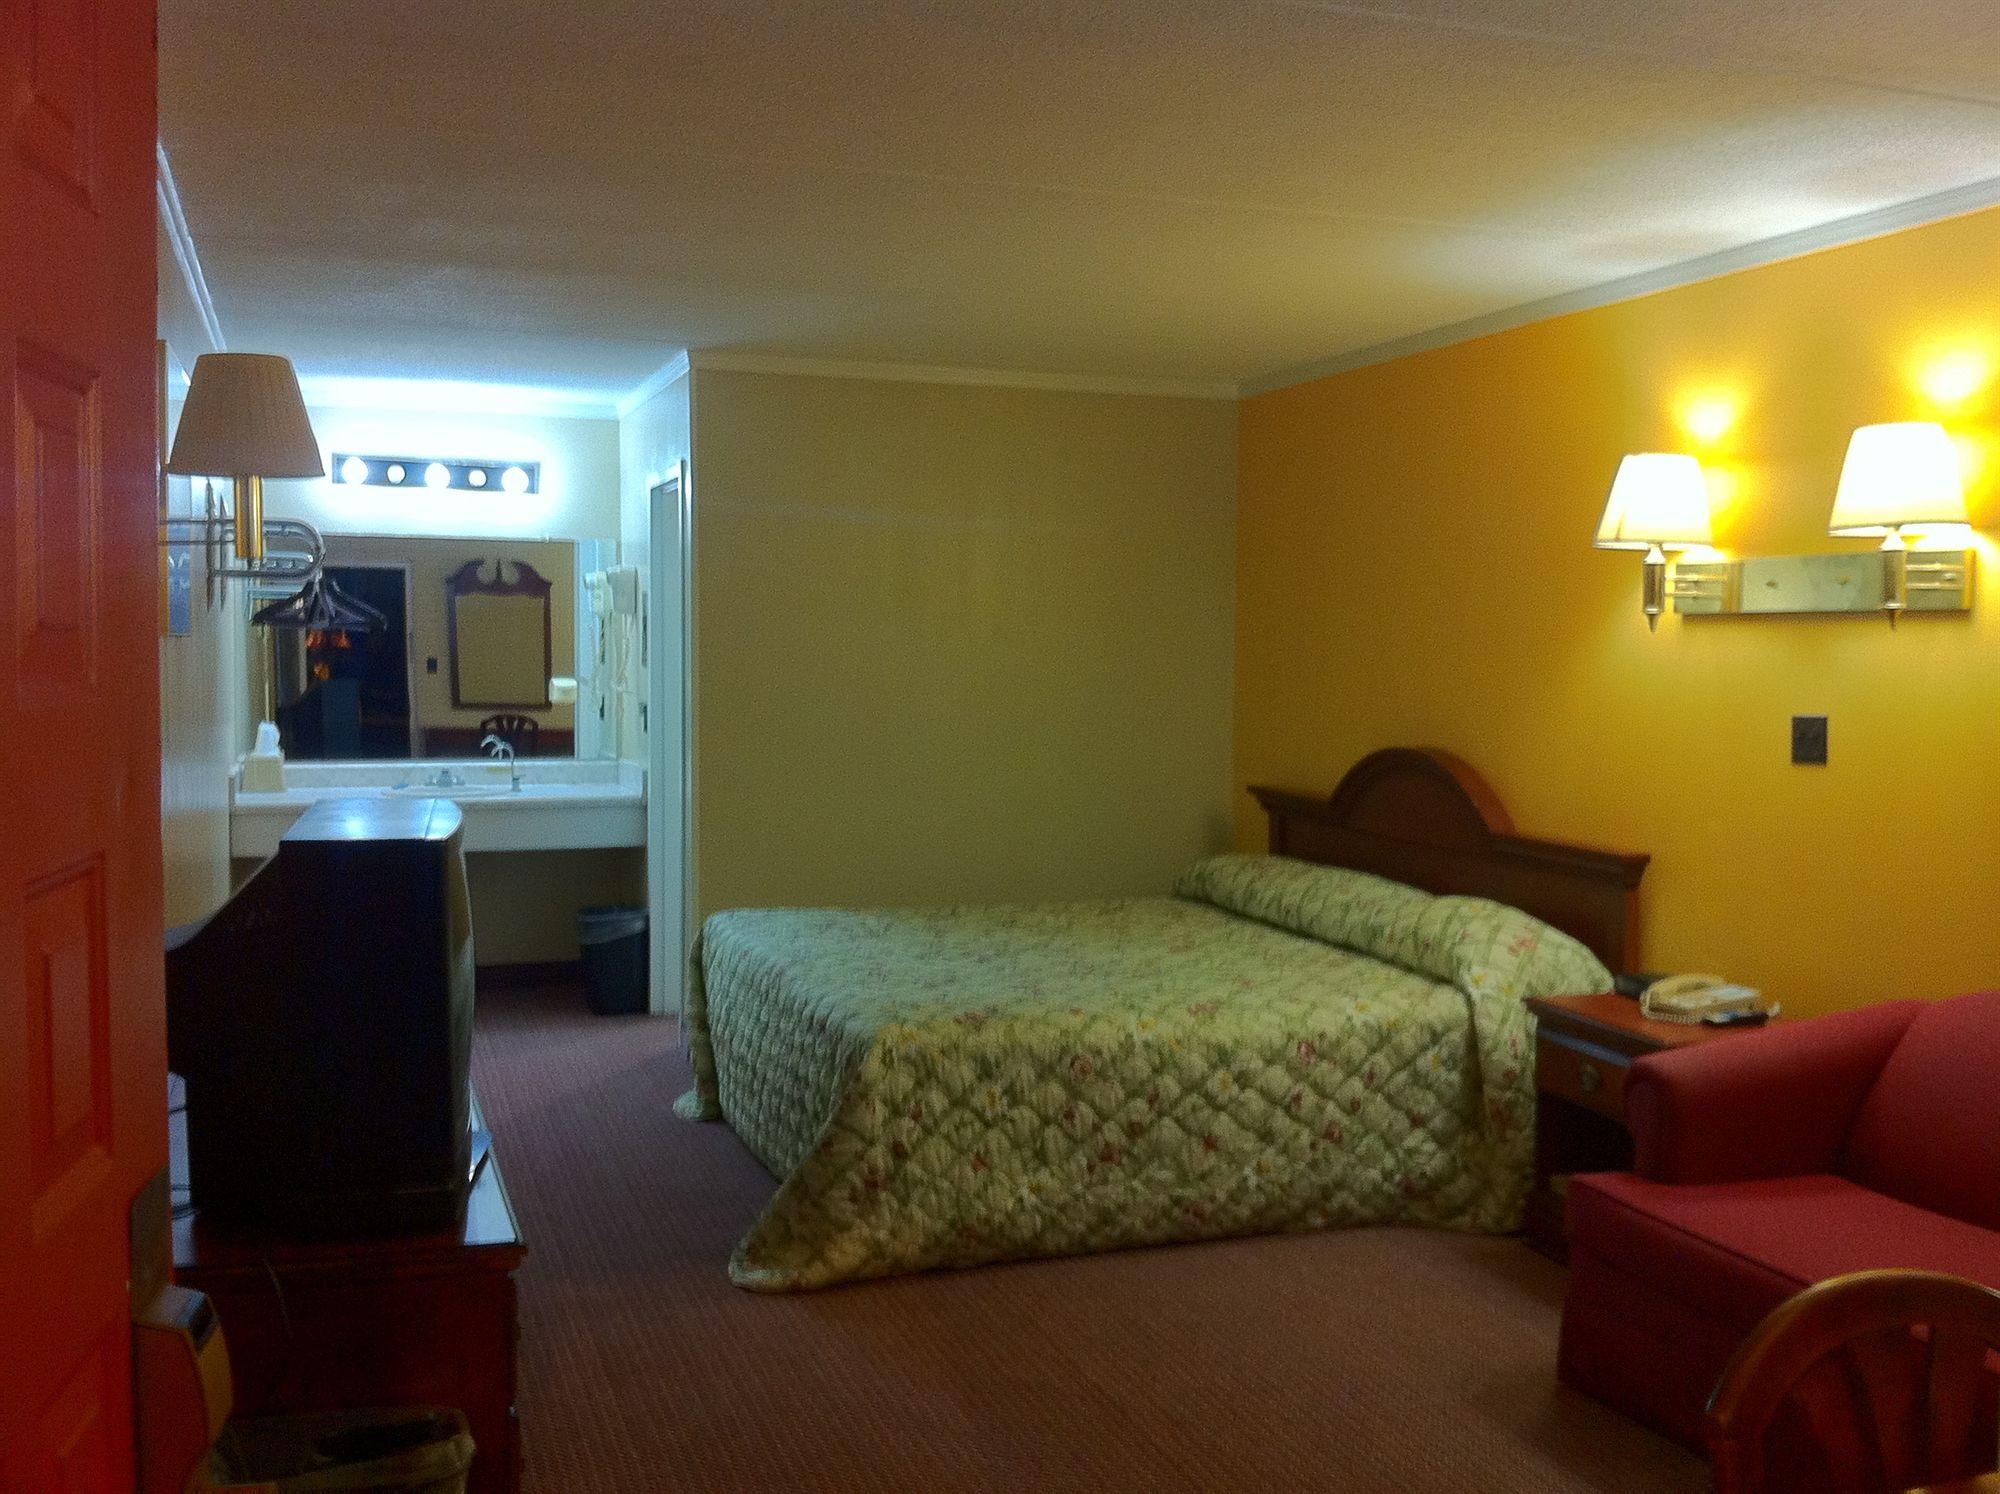 Charlotte Hotel Coupons for Charlotte, North Carolina ...